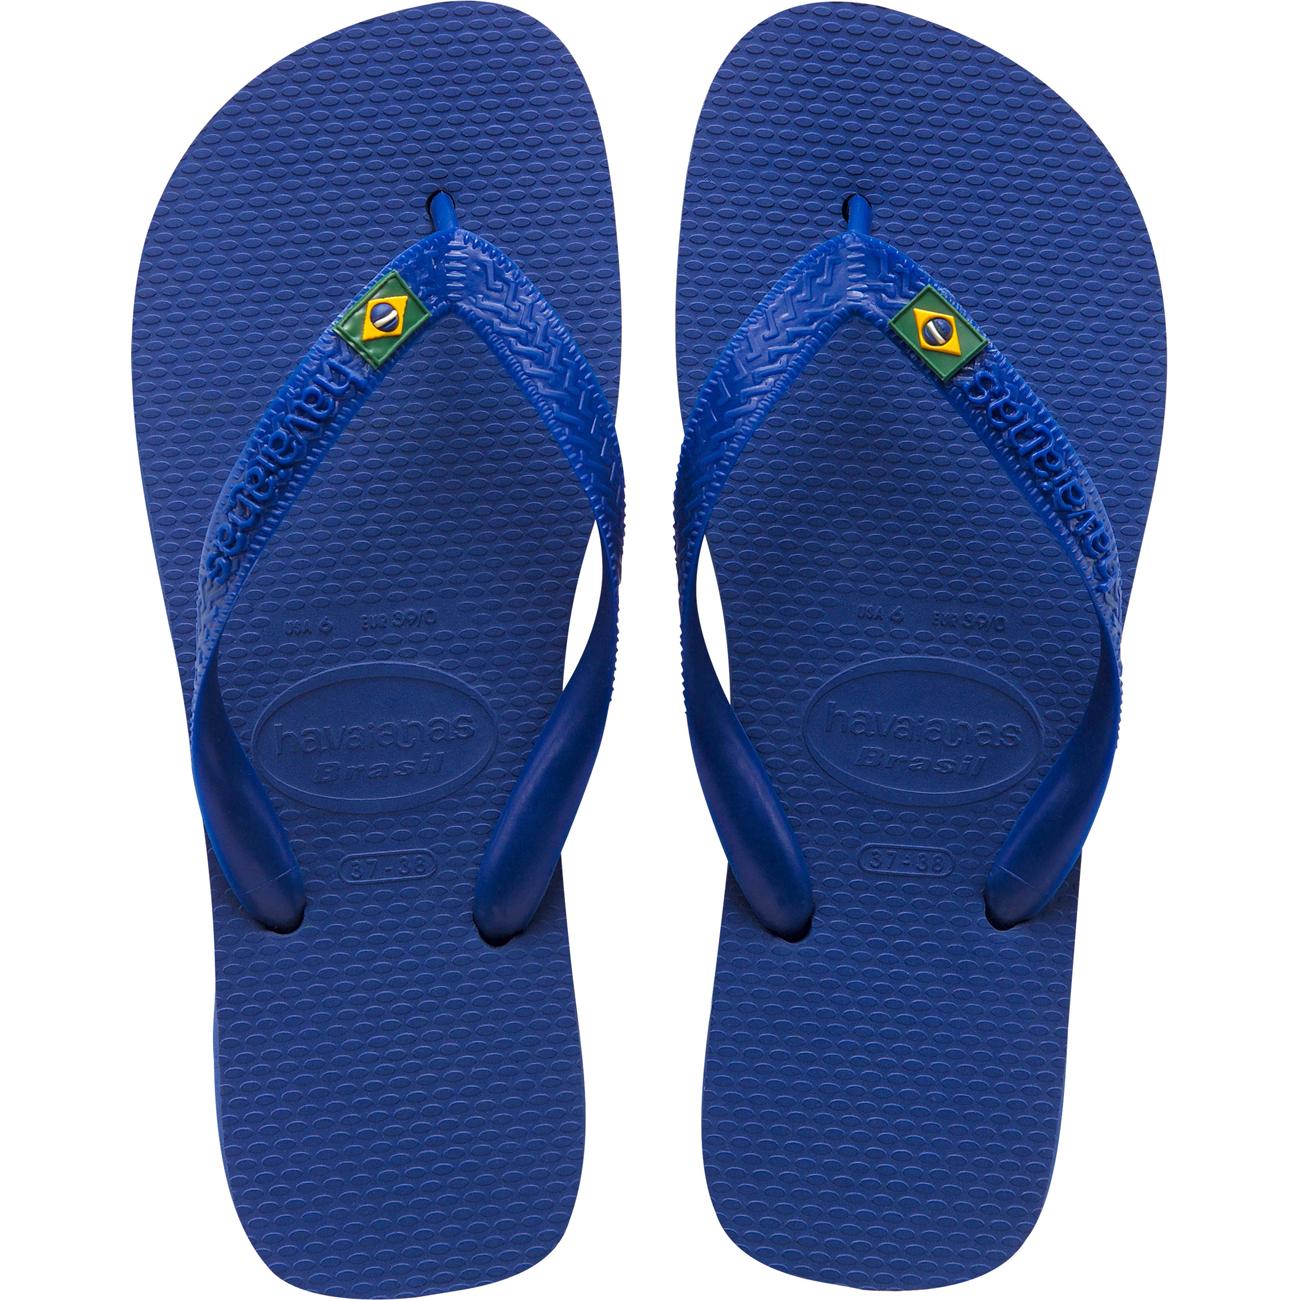 Sandalia Havaianas Brasil Azul Naval 33/4